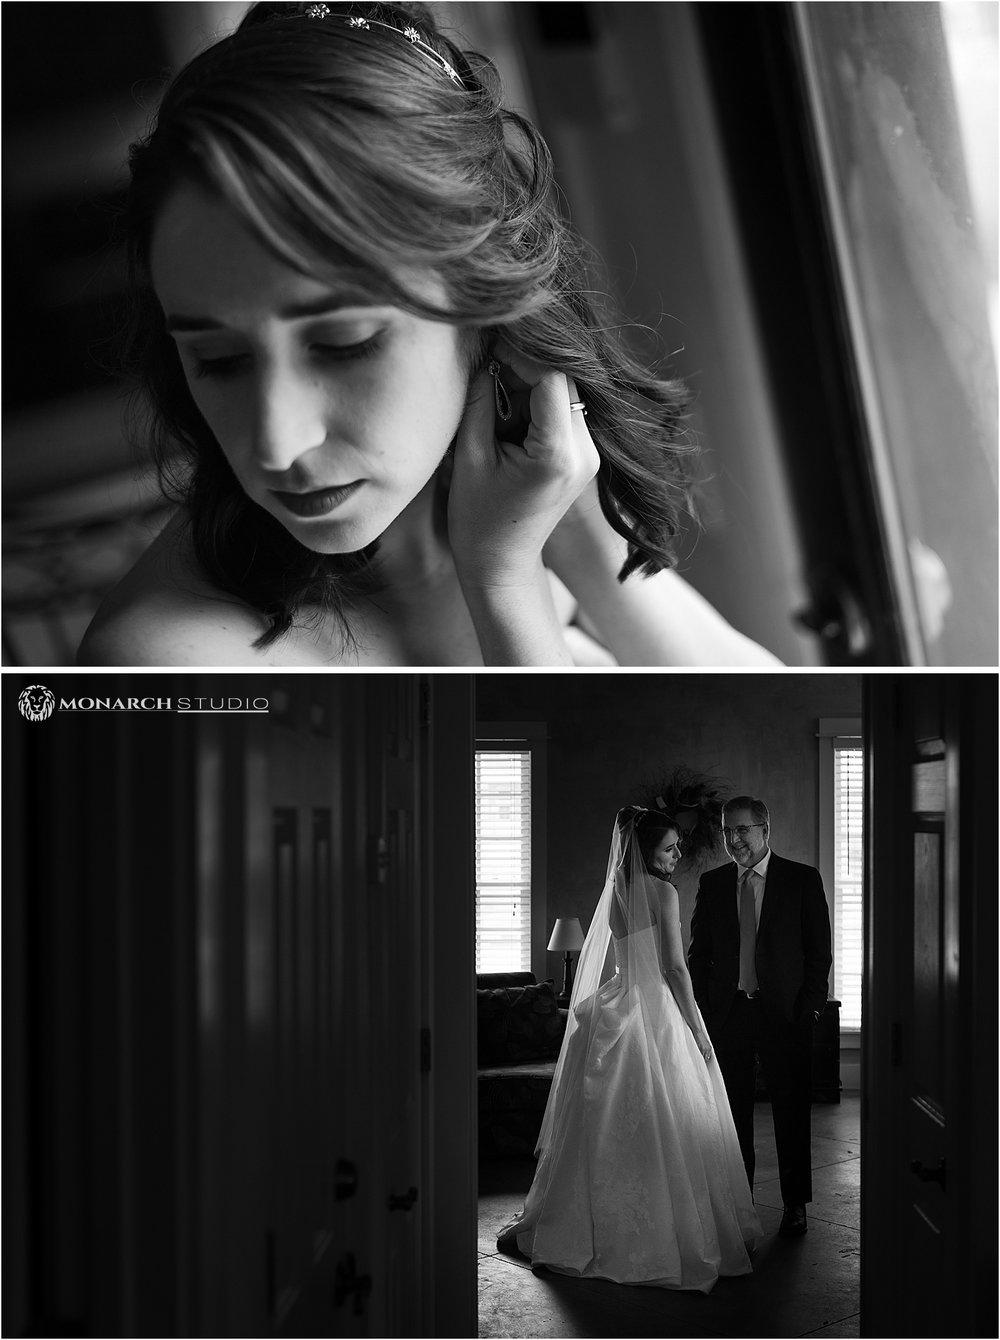 wedding-at-oldest-house-st-augustine-009.jpg